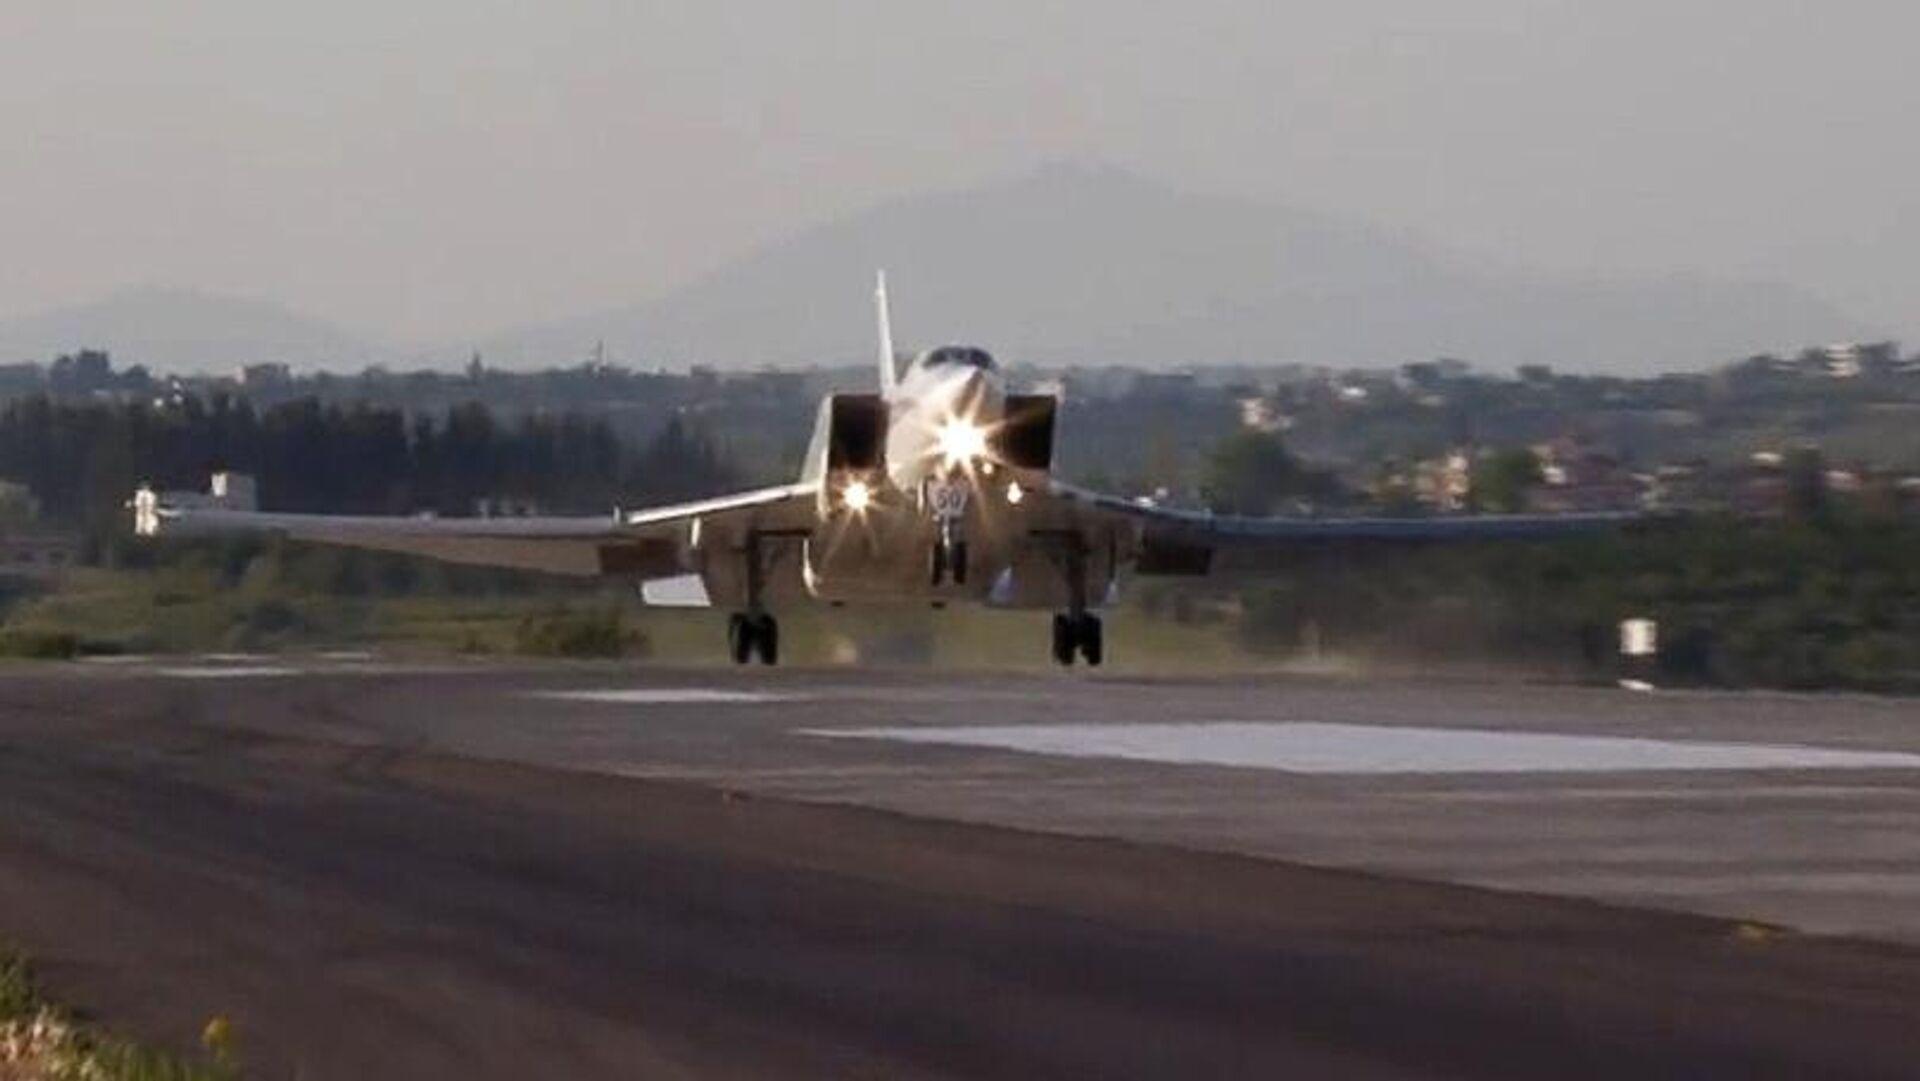 Дальний бомбардировщик Ту-22М3 совершает посадку на авиабазе Хмеймим в Сирии. Кадр видео - РИА Новости, 1920, 25.05.2021